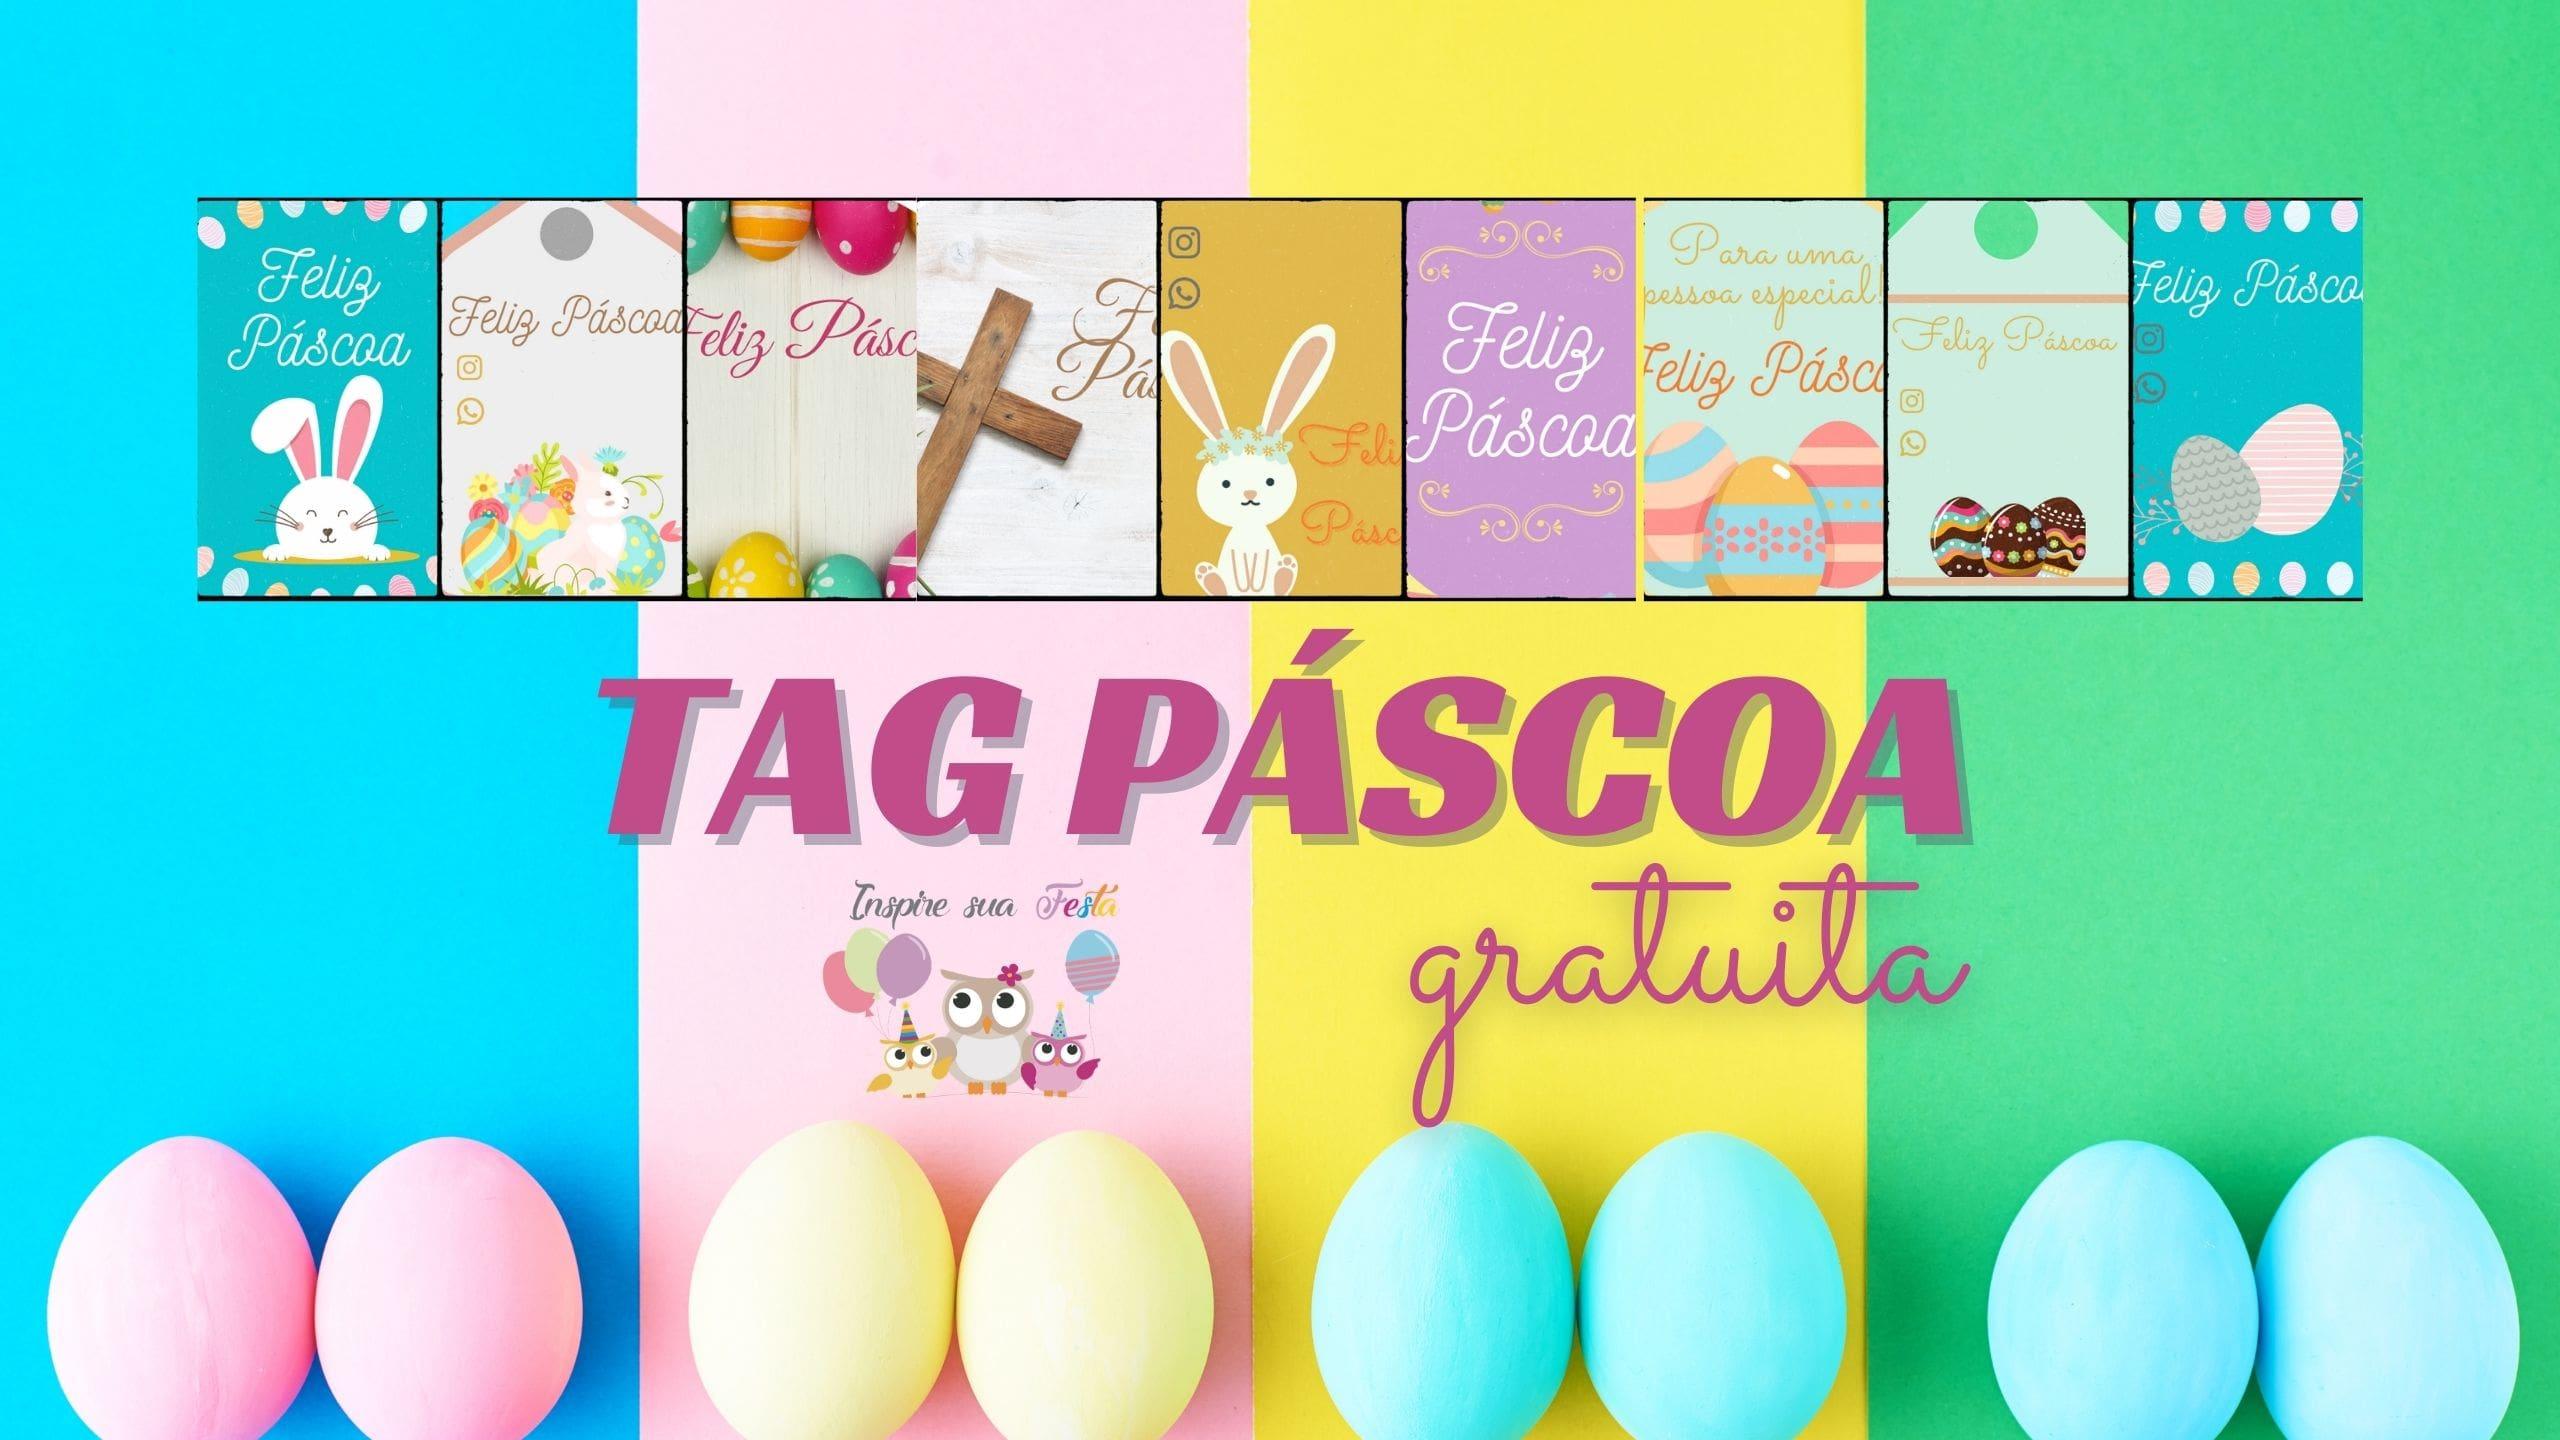 Etiquetas personalizadas para Páscoa – Gratuitas